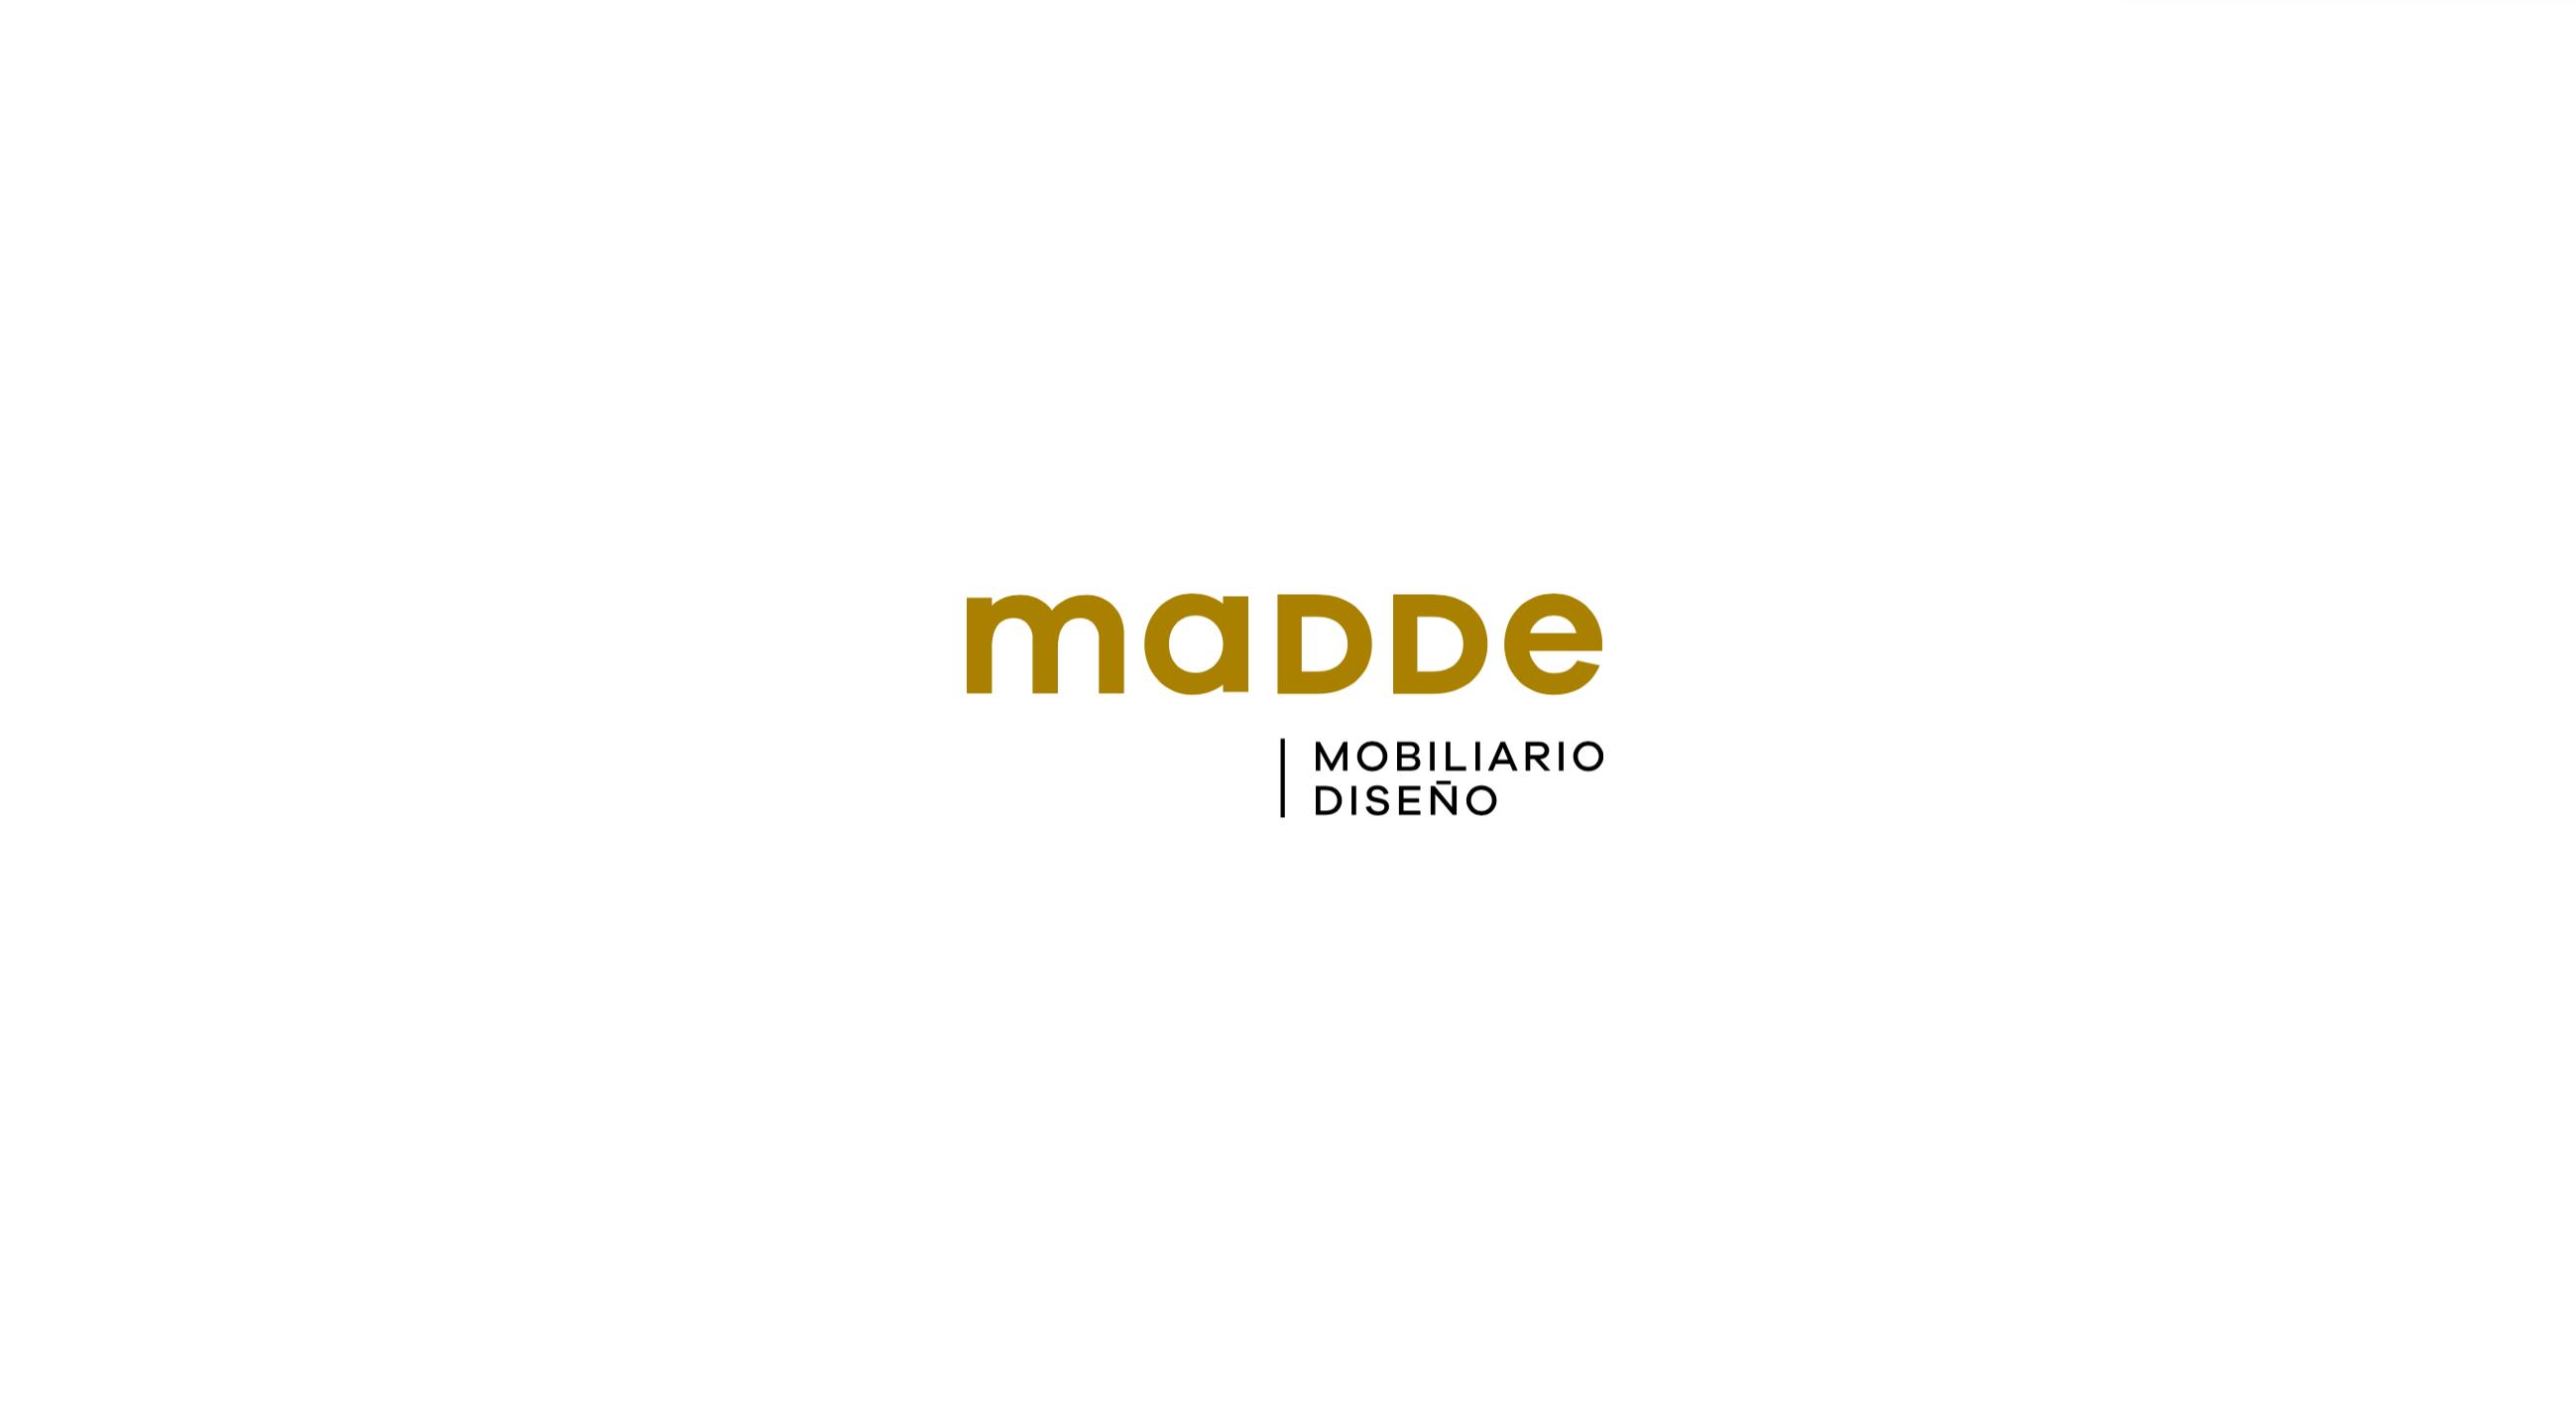 Diseño logo Madde